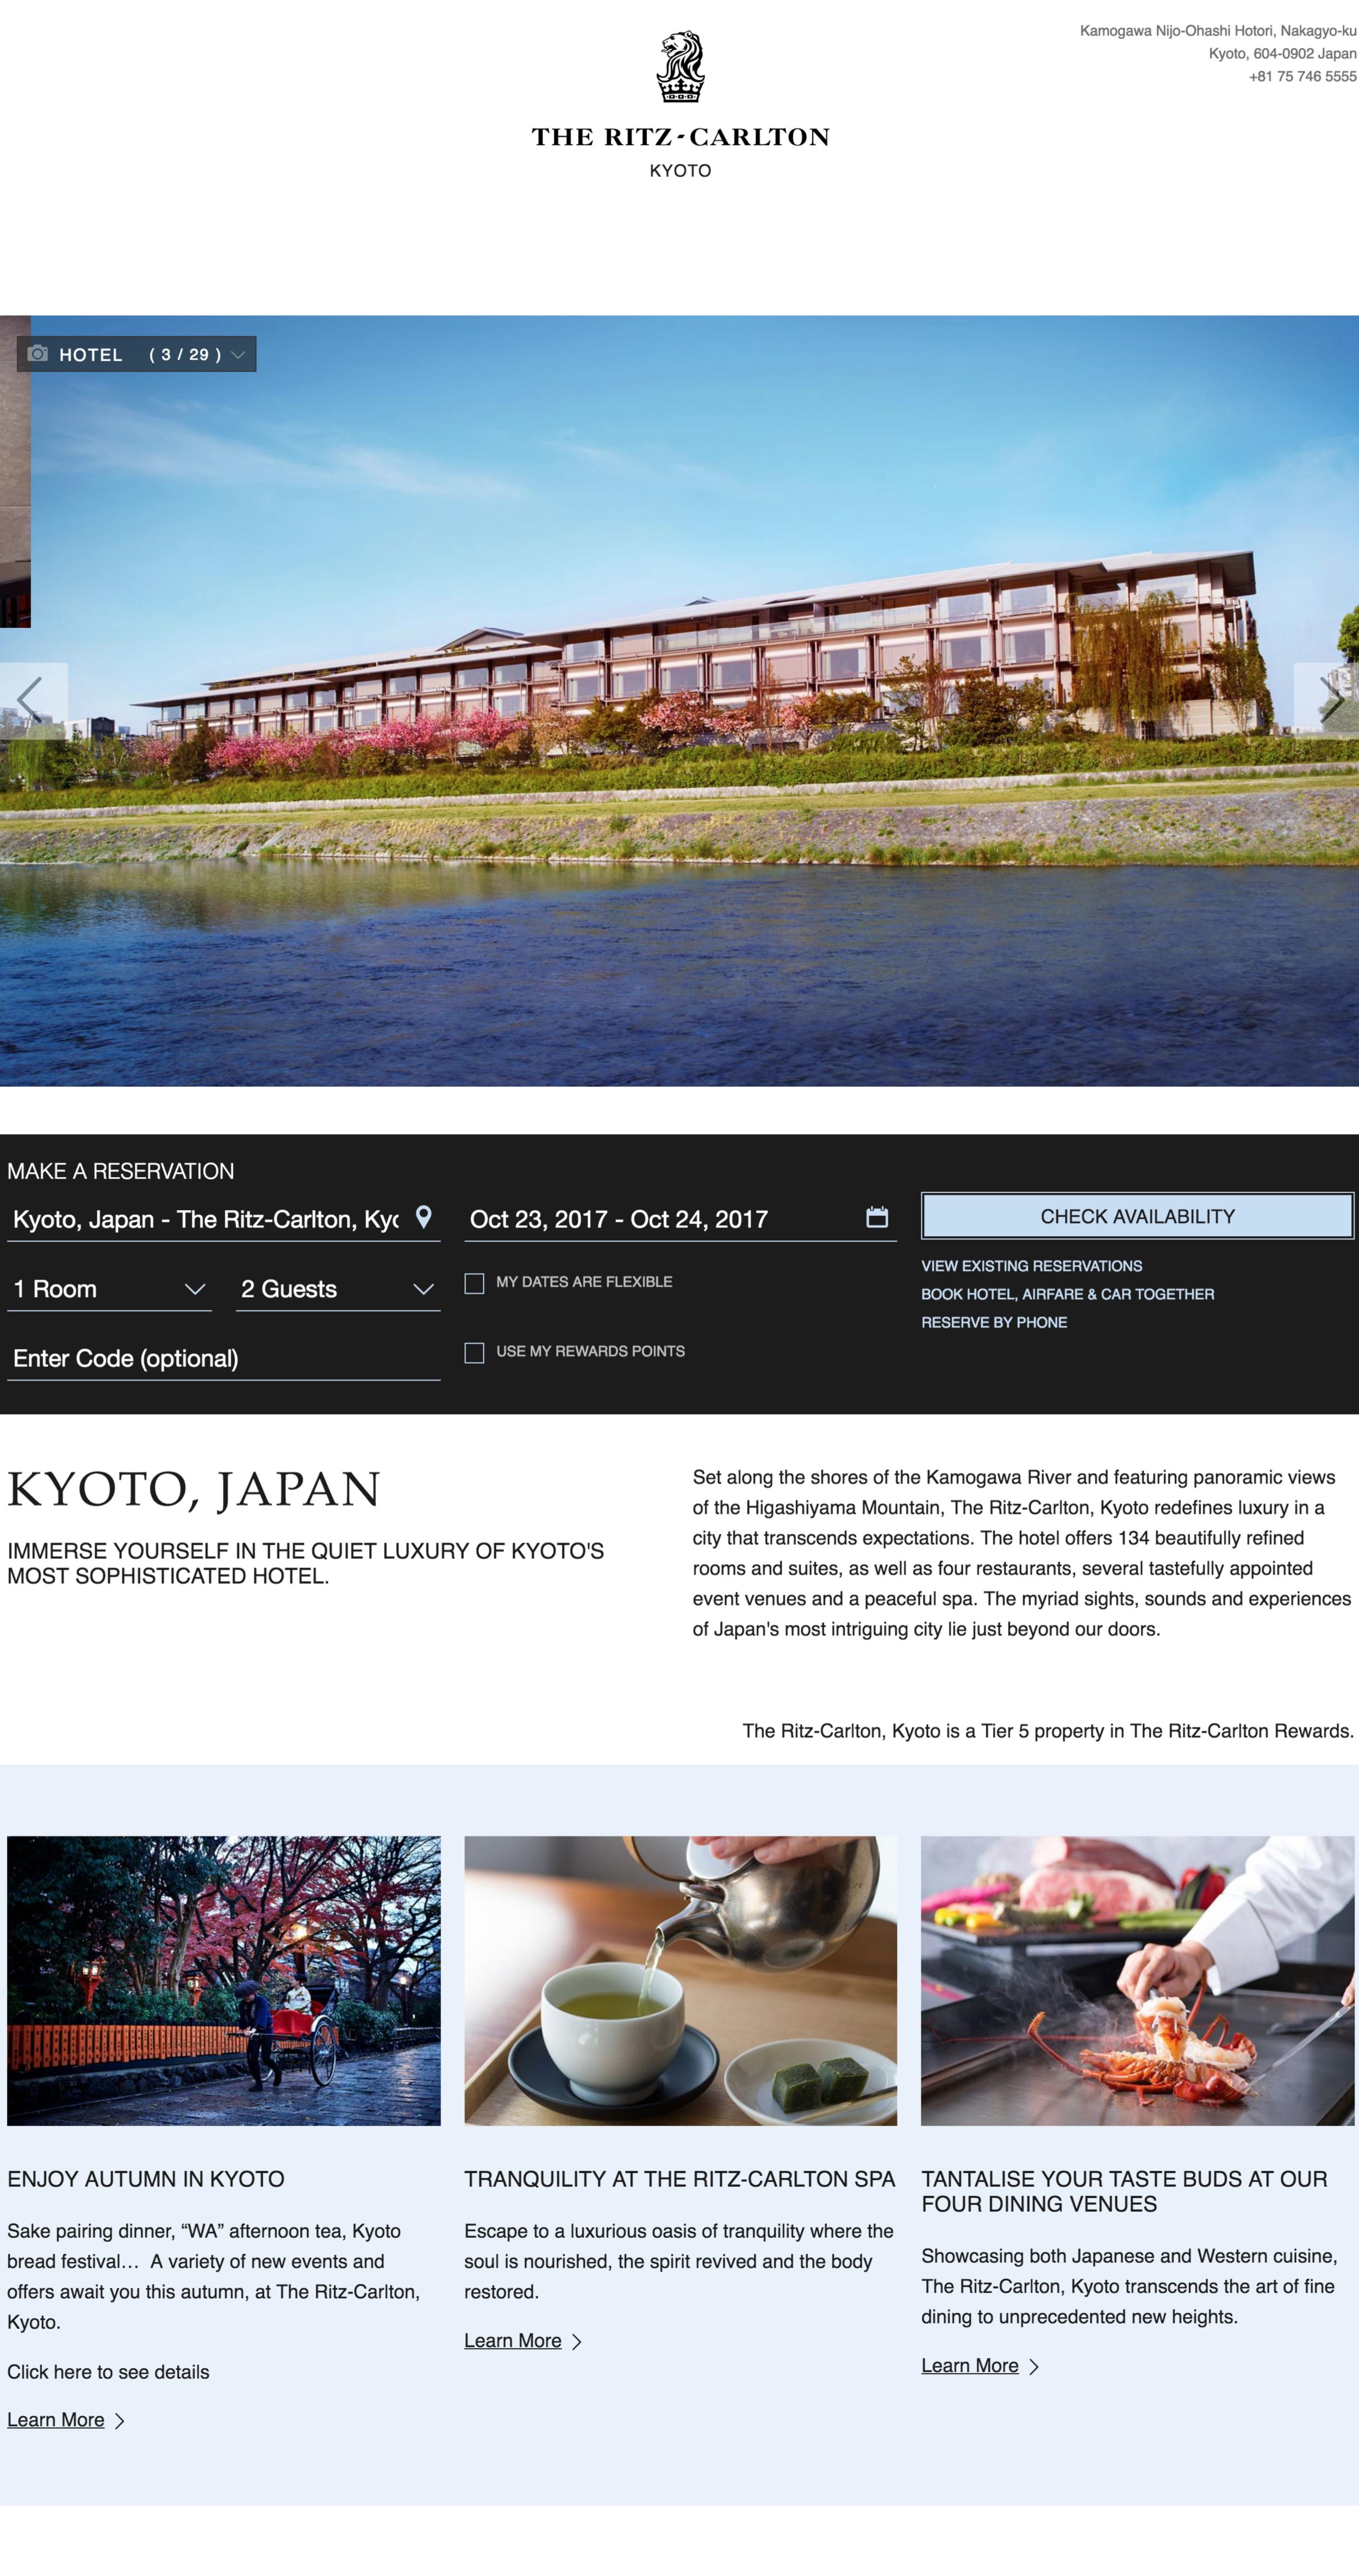 Ritz-Carlton Kyoto homepage